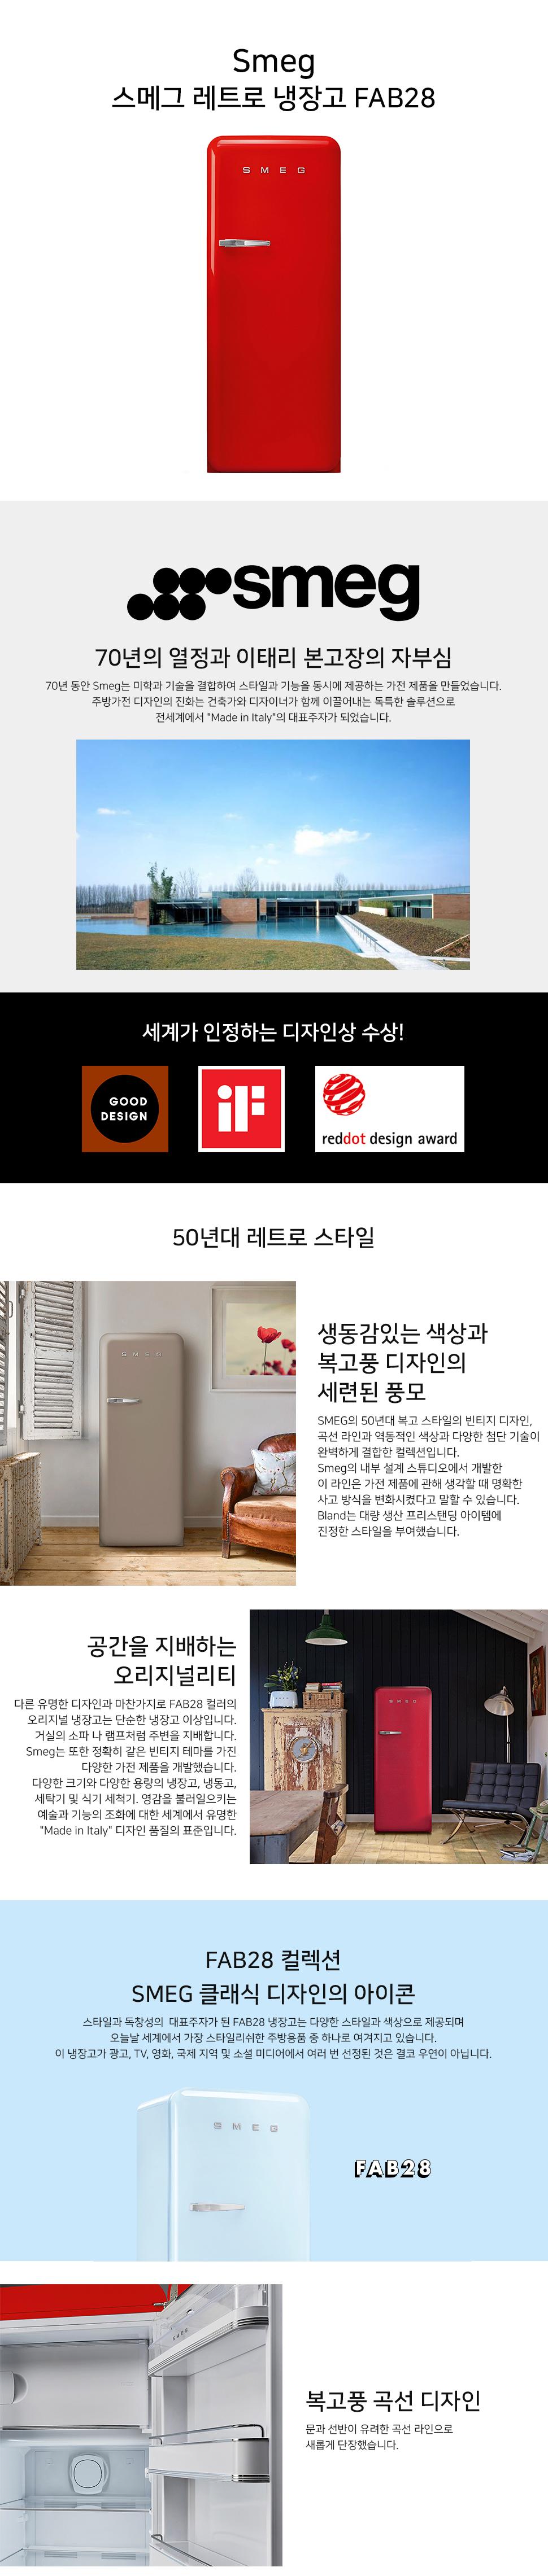 Smeg_Refrigeratiors_FAB28_01.jpg